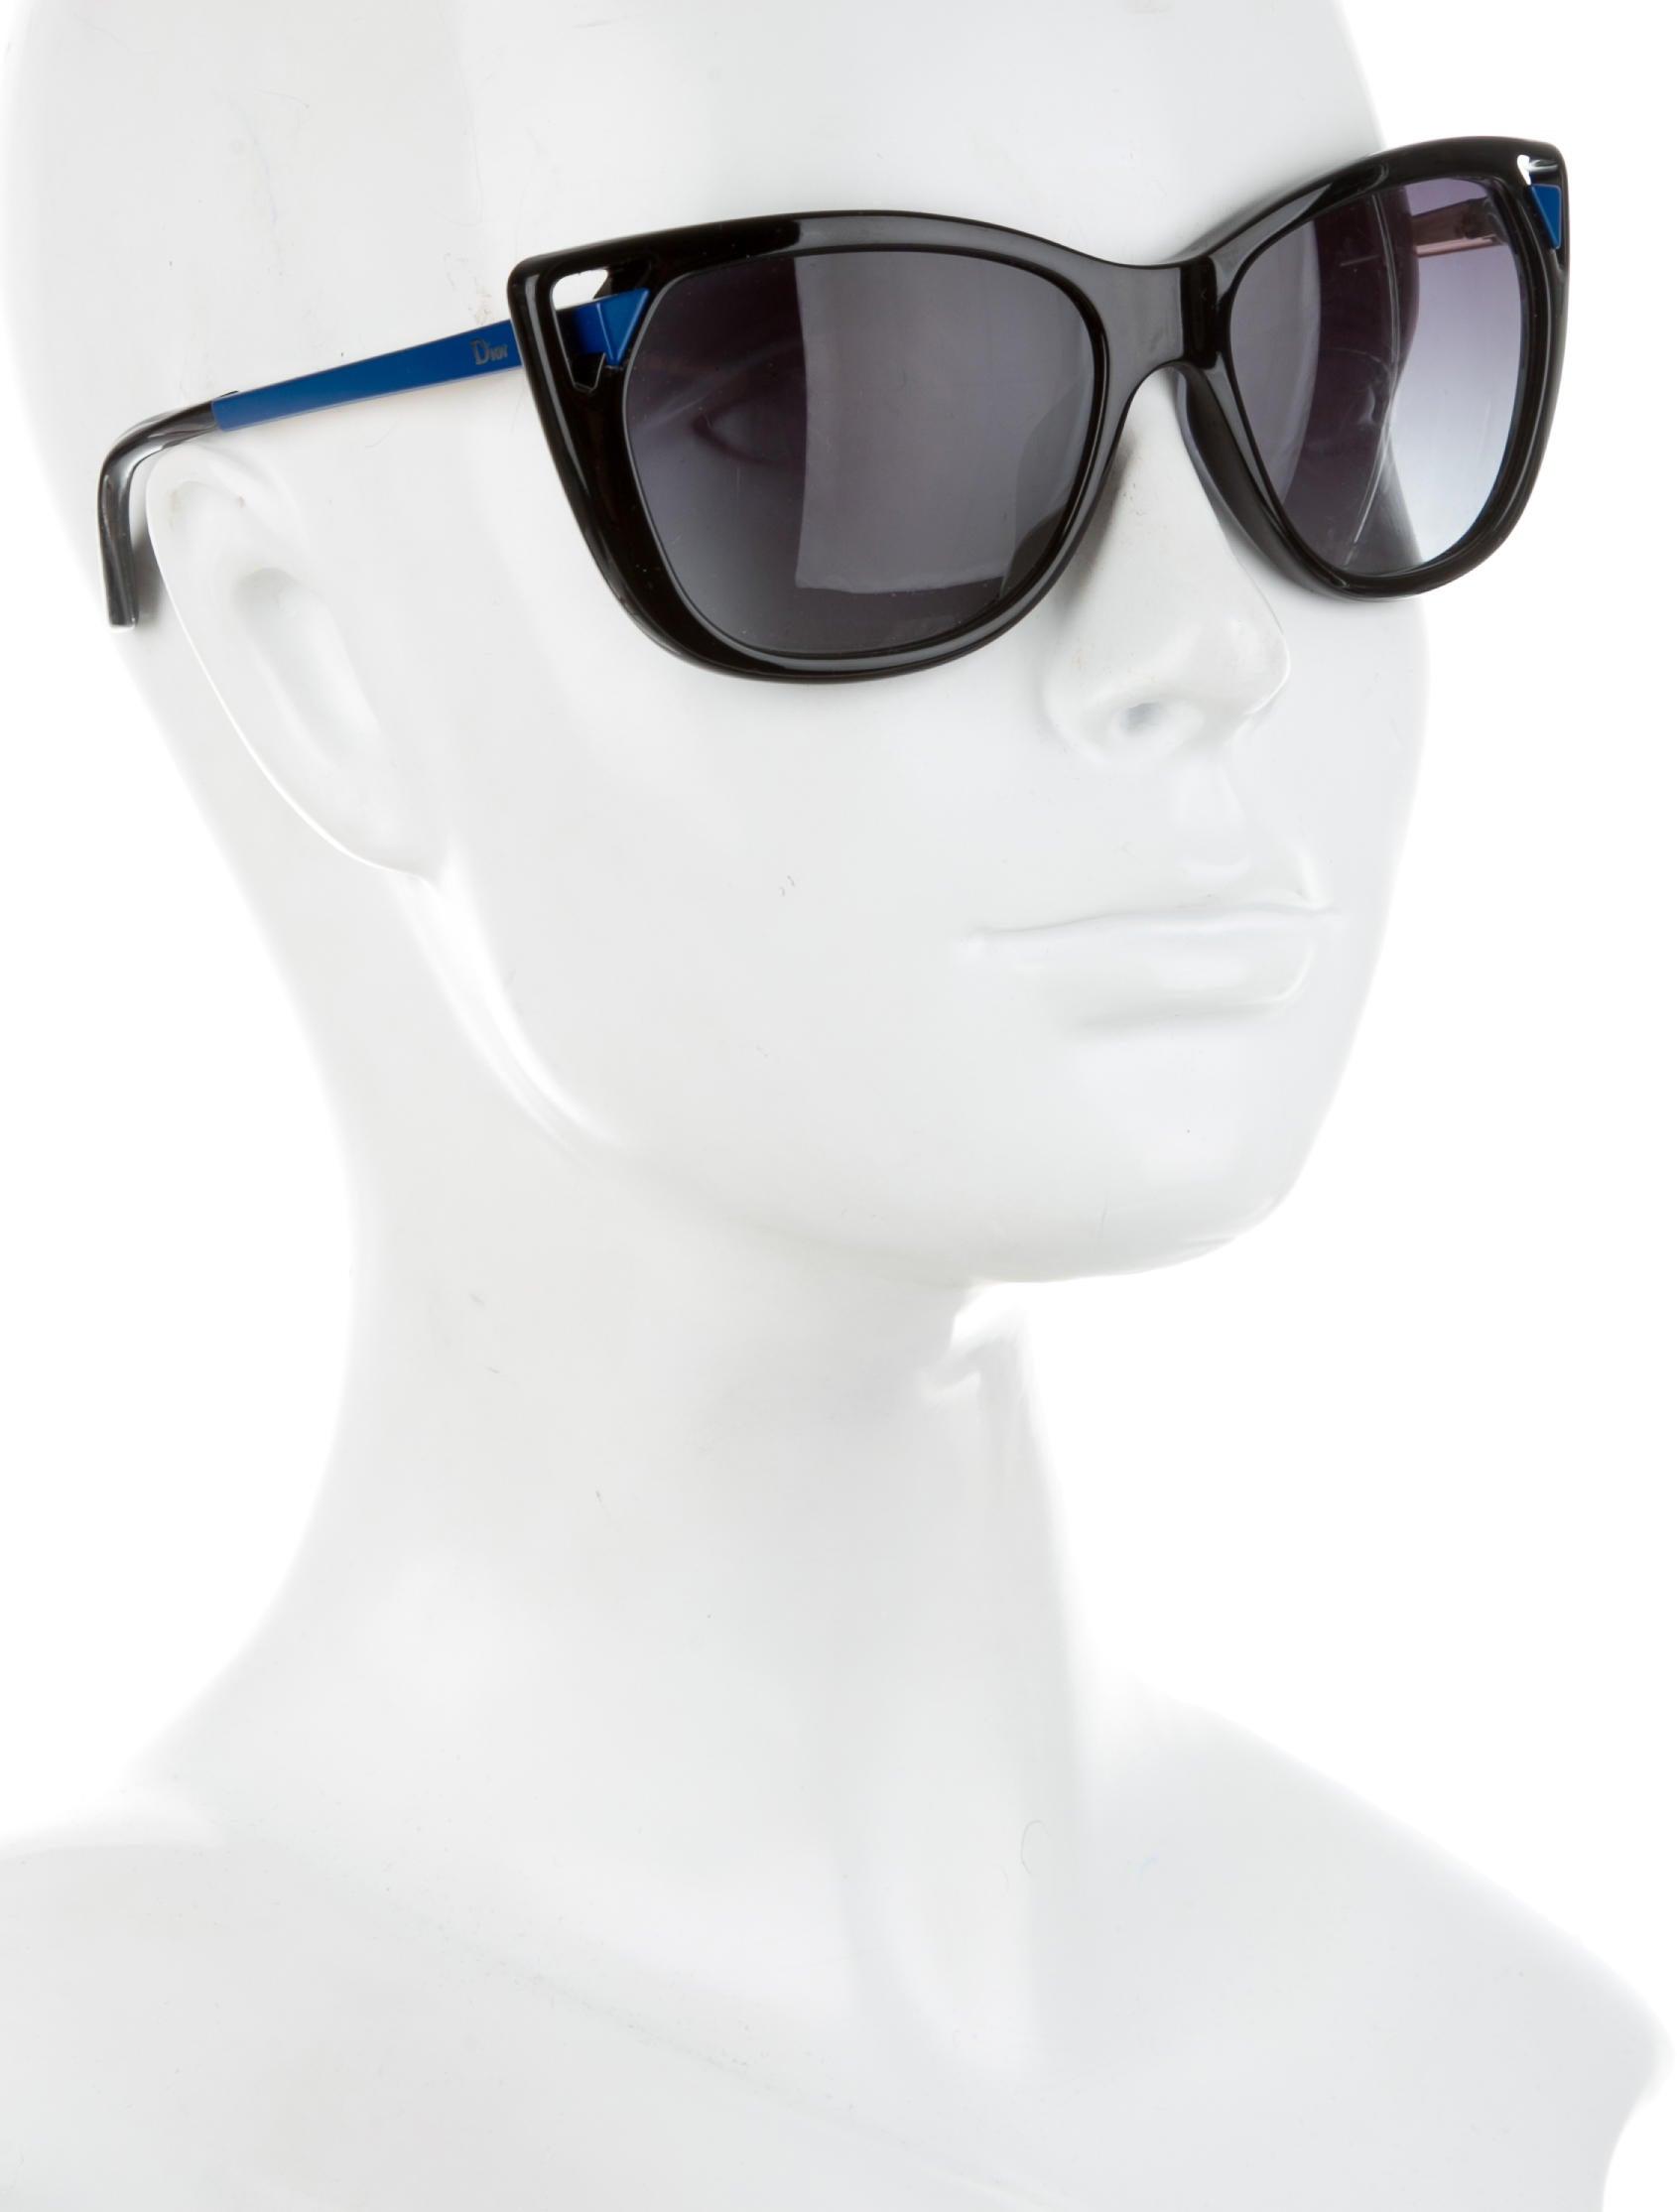 54e93c0140bde Christian Dior Lady 1 Sunglasses